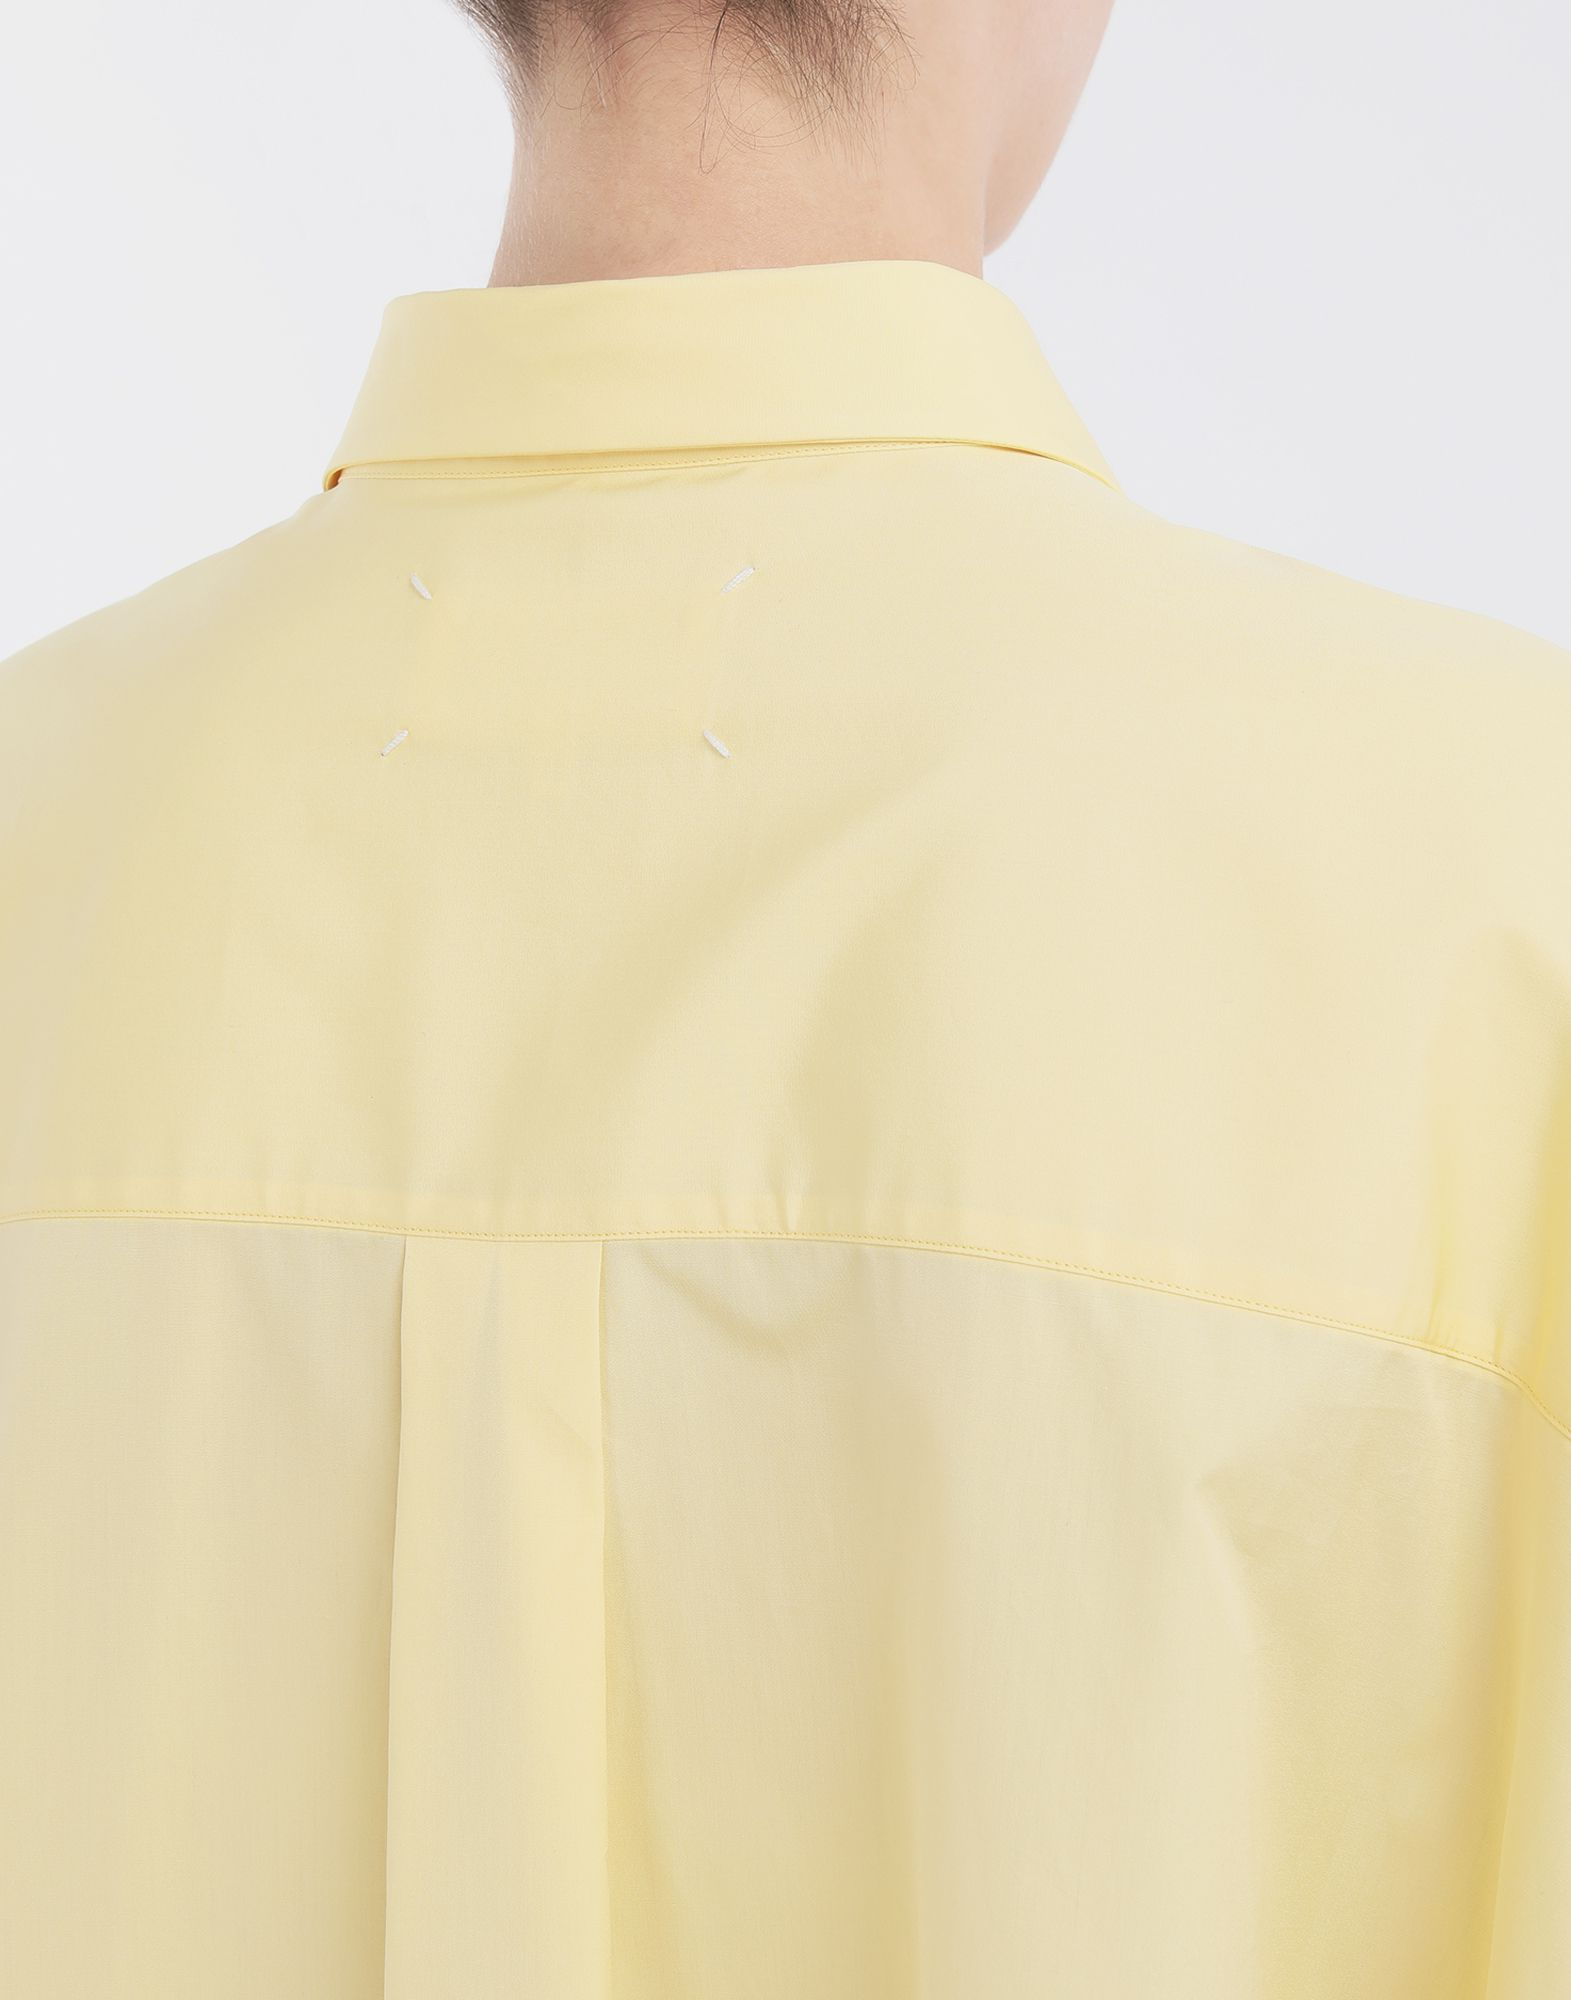 MAISON MARGIELA Oversized shirt Long sleeve shirt Woman a